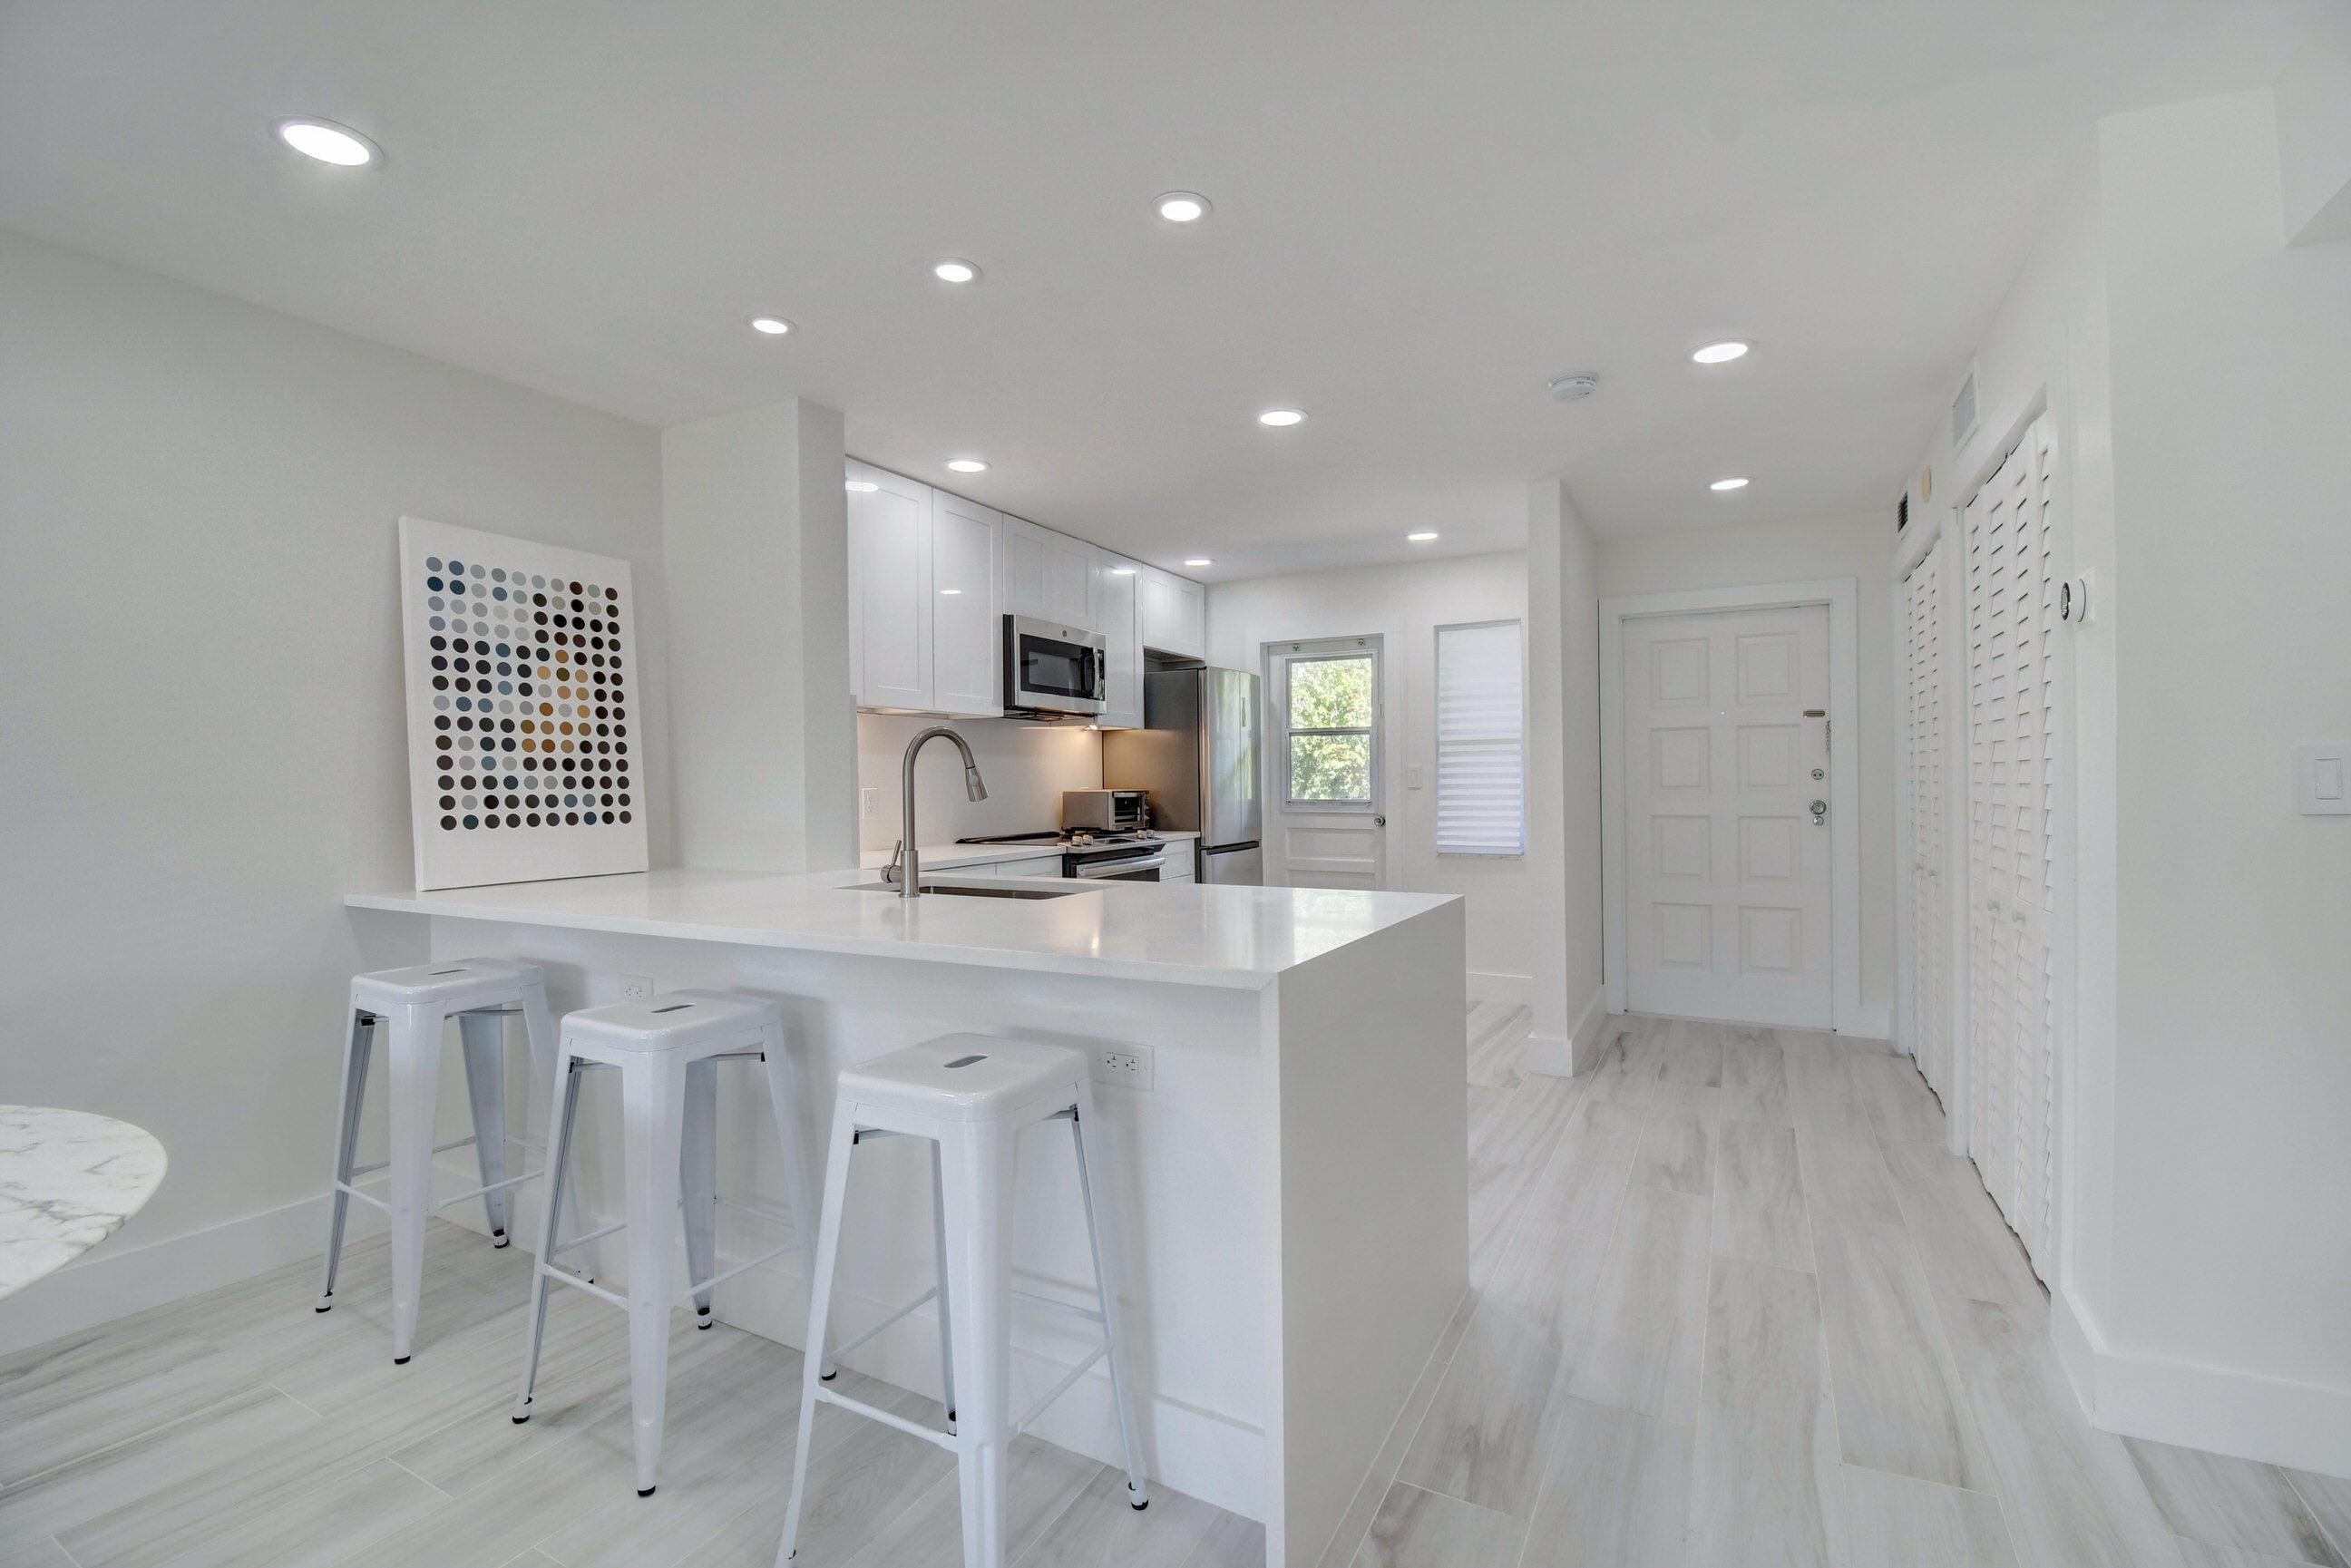 2871 Ocean Boulevard, Boca Raton, Florida 33431, 2 Bedrooms Bedrooms, ,2 BathroomsBathrooms,Residential,For Sale,Ocean,RX-10611104